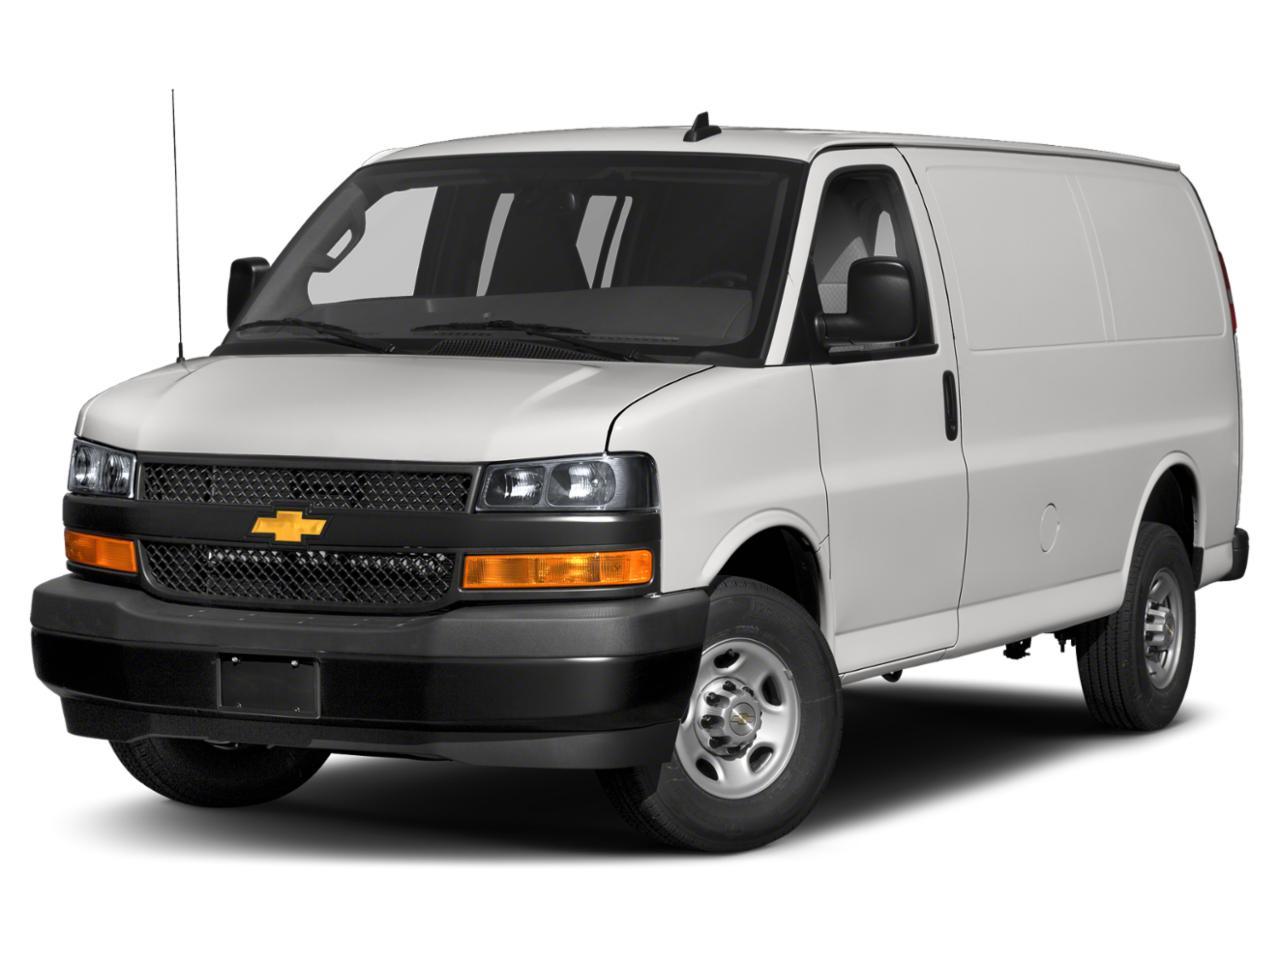 2018 Chevrolet Express Cargo Van Vehicle Photo in BATON ROUGE, LA 70806-4464